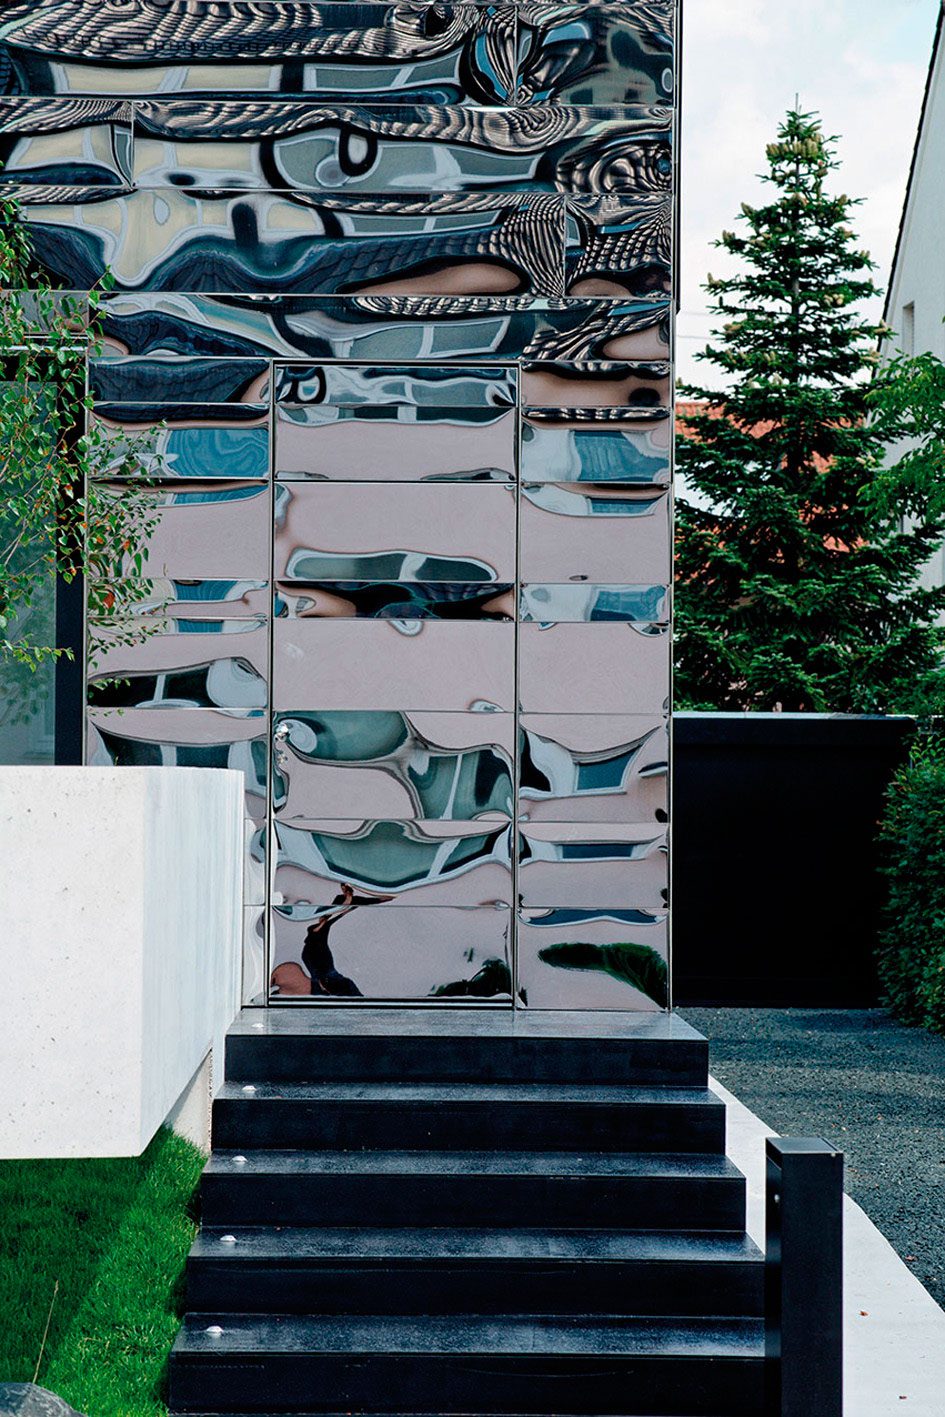 Wz2, Bernd Zimmermann, Reflective Mirror Home Design, Photography Valentin Wormbs